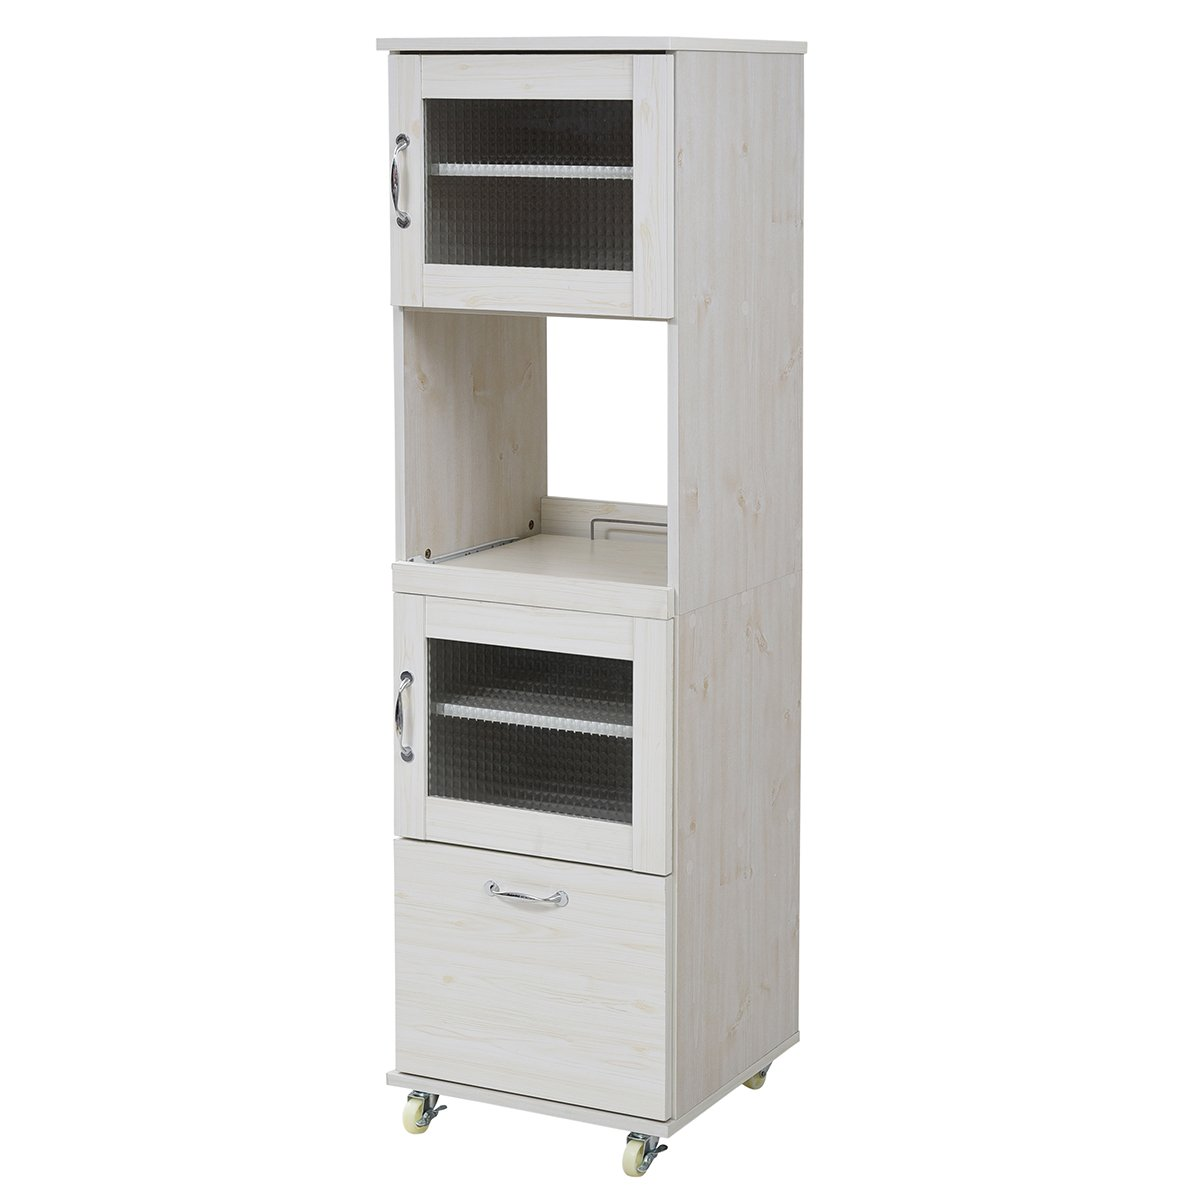 JKプラン スリム レンジ台 食器棚 レンジラック 幅 45 H156 キッチン 収納 隙間収納 棚 収納棚 スライド キッチンラック キッチン棚 ラック FLL-0066-WH B079N27DPR Parent ホワイト